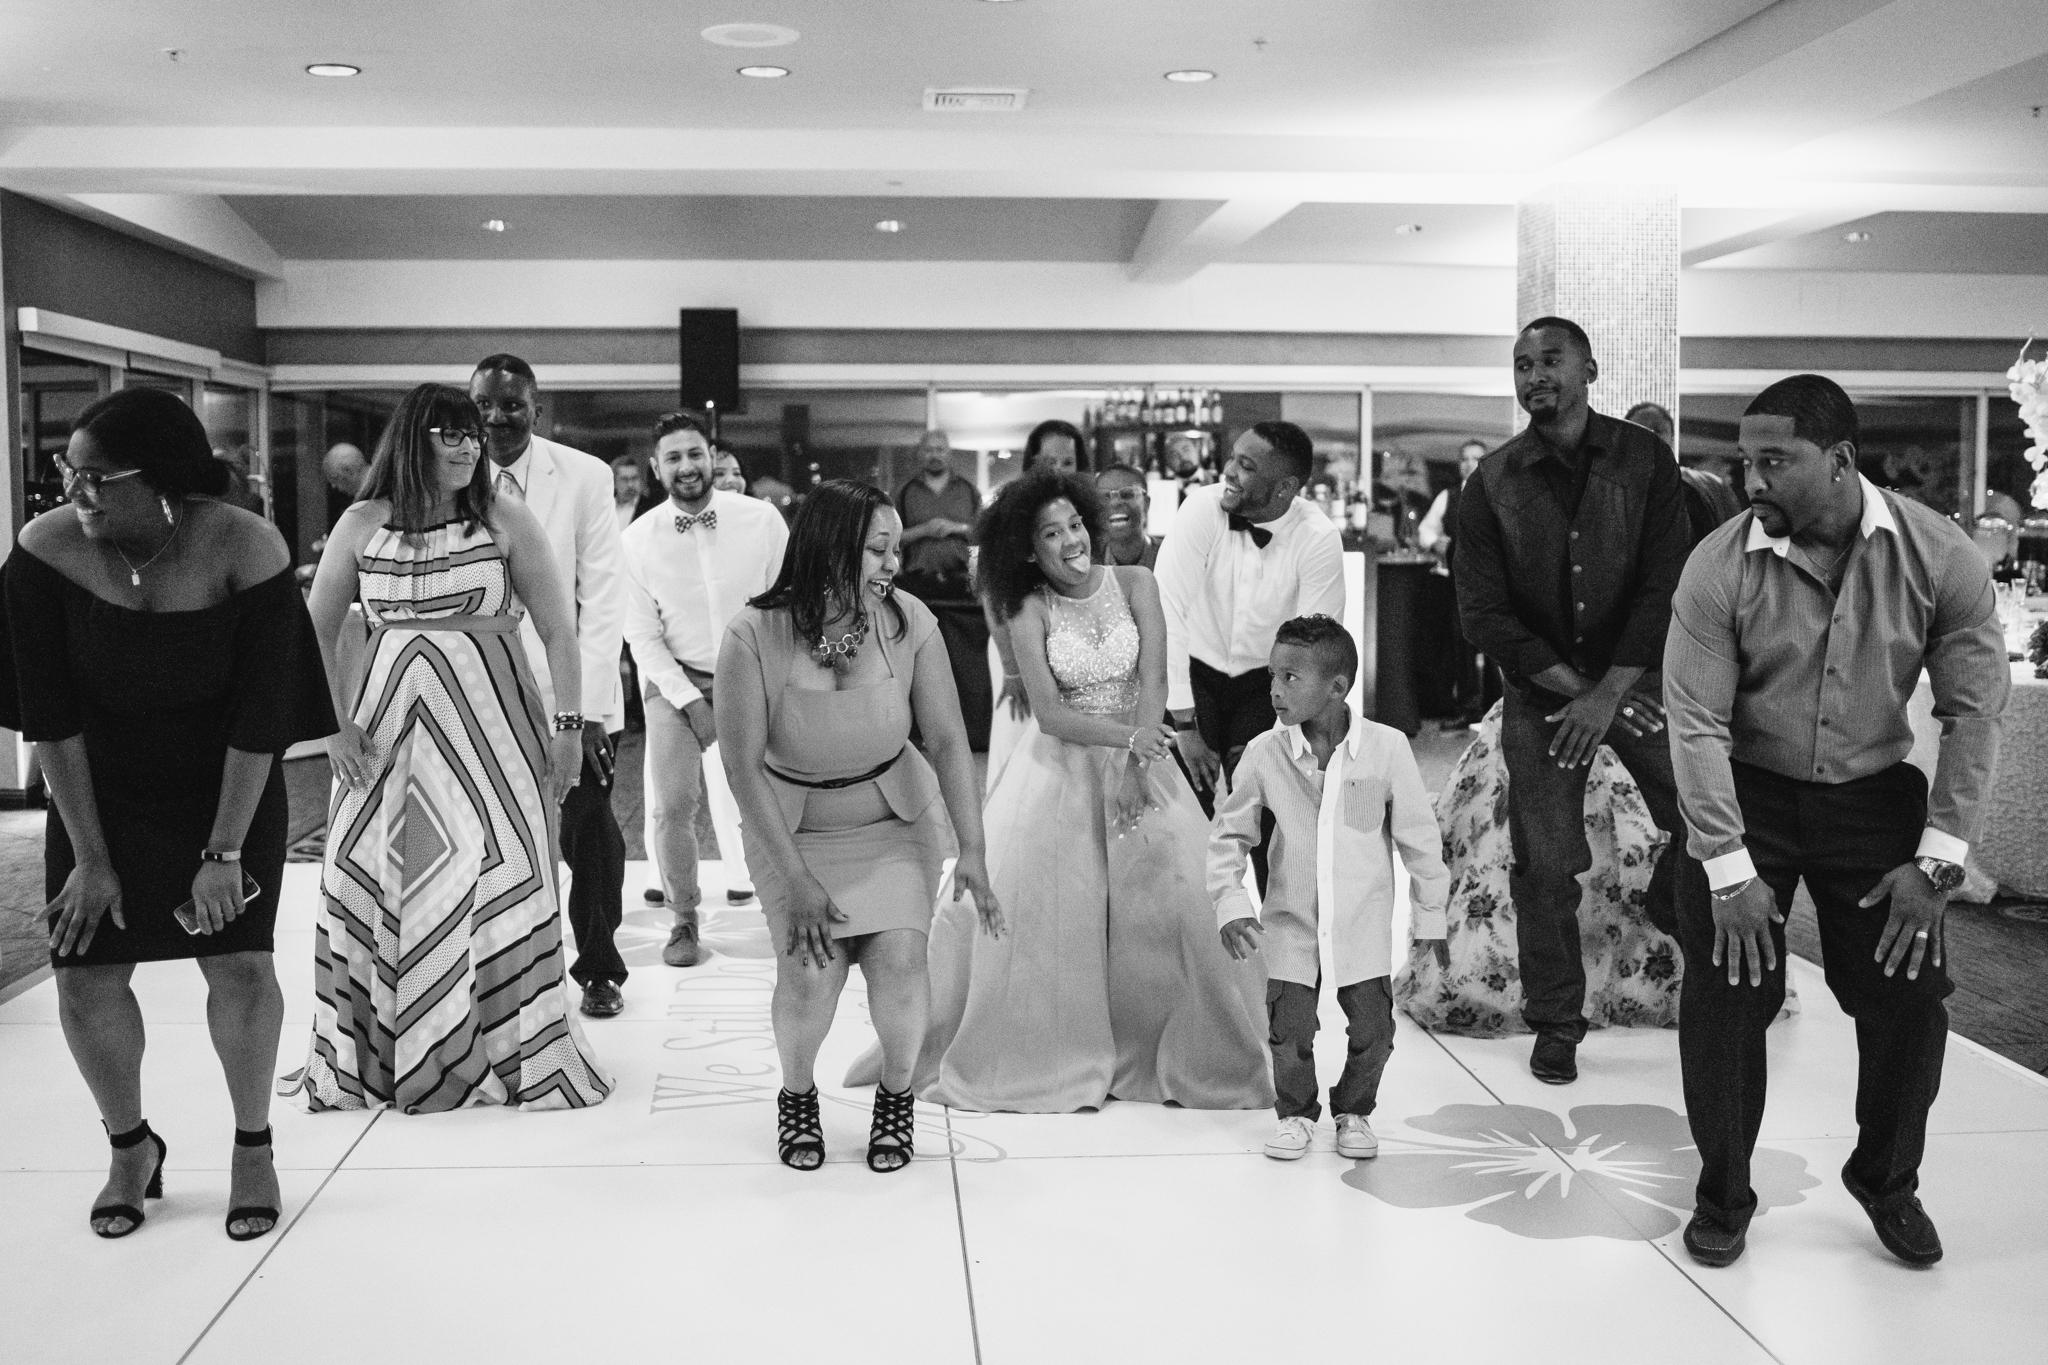 wedding-line-dance-party-rebeccaylasotras-1.jpg